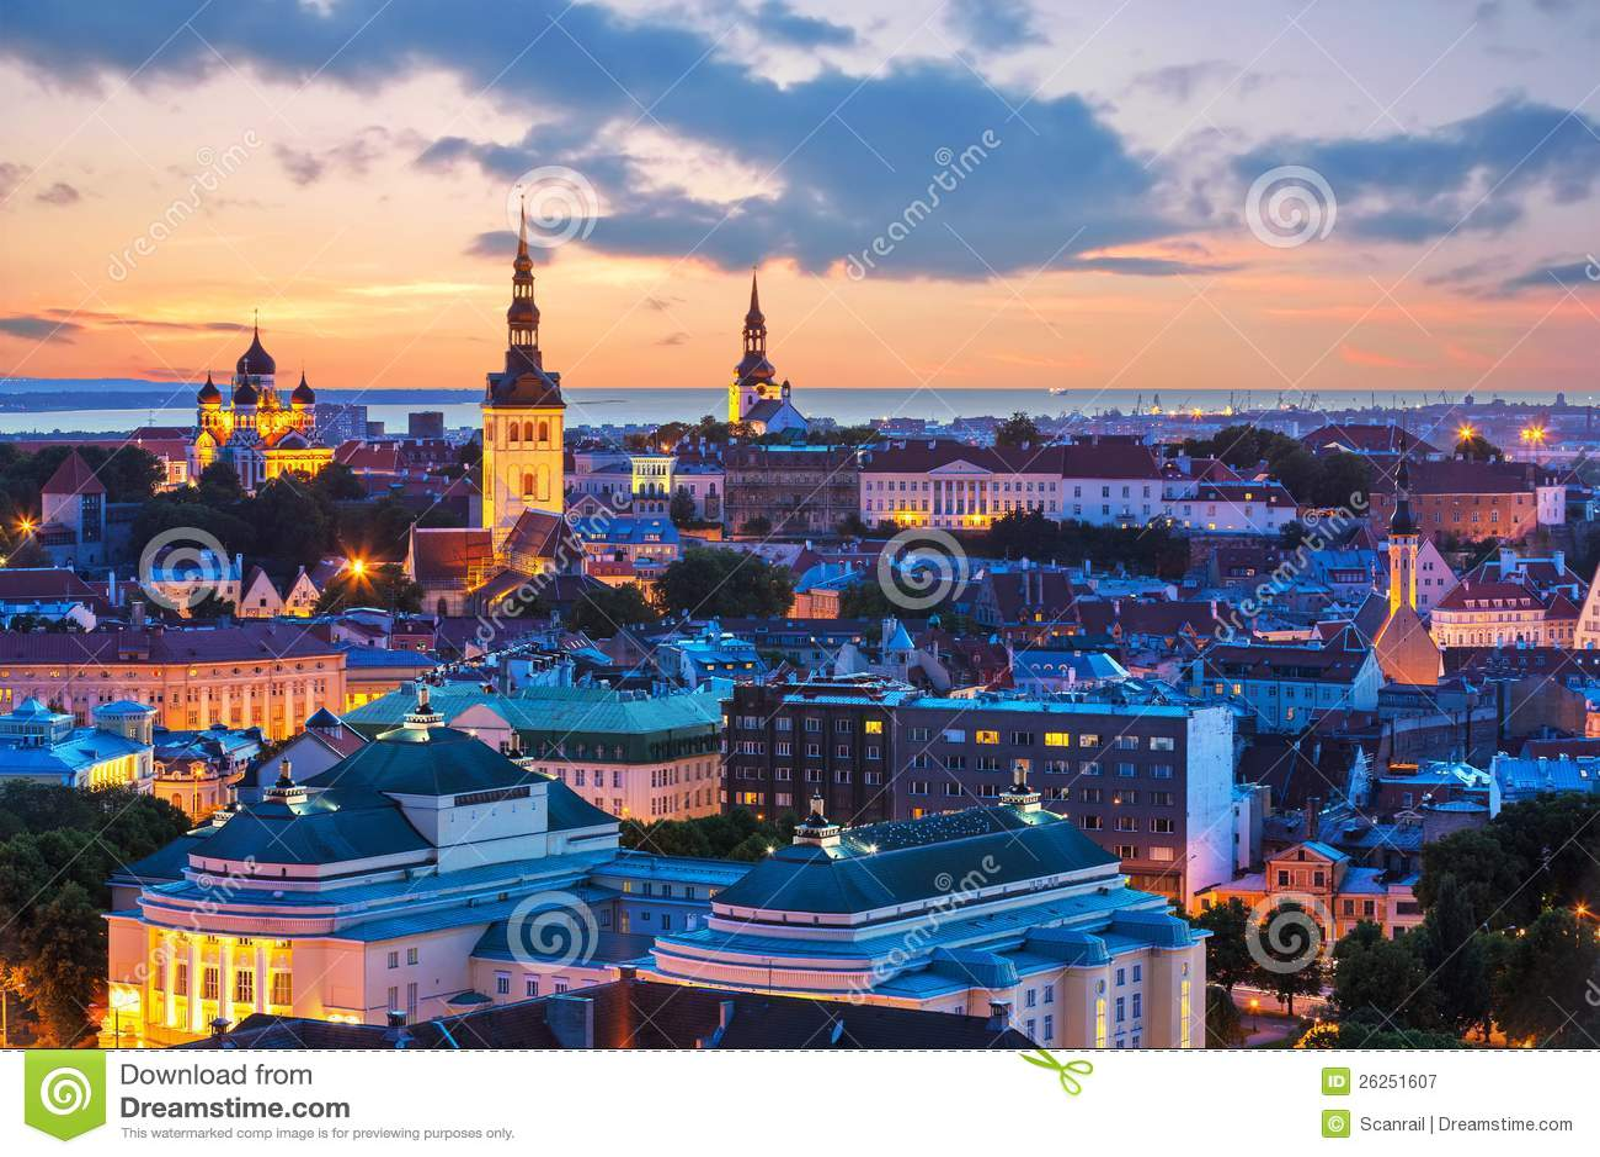 Evening scenery of Tallinn, Estonia